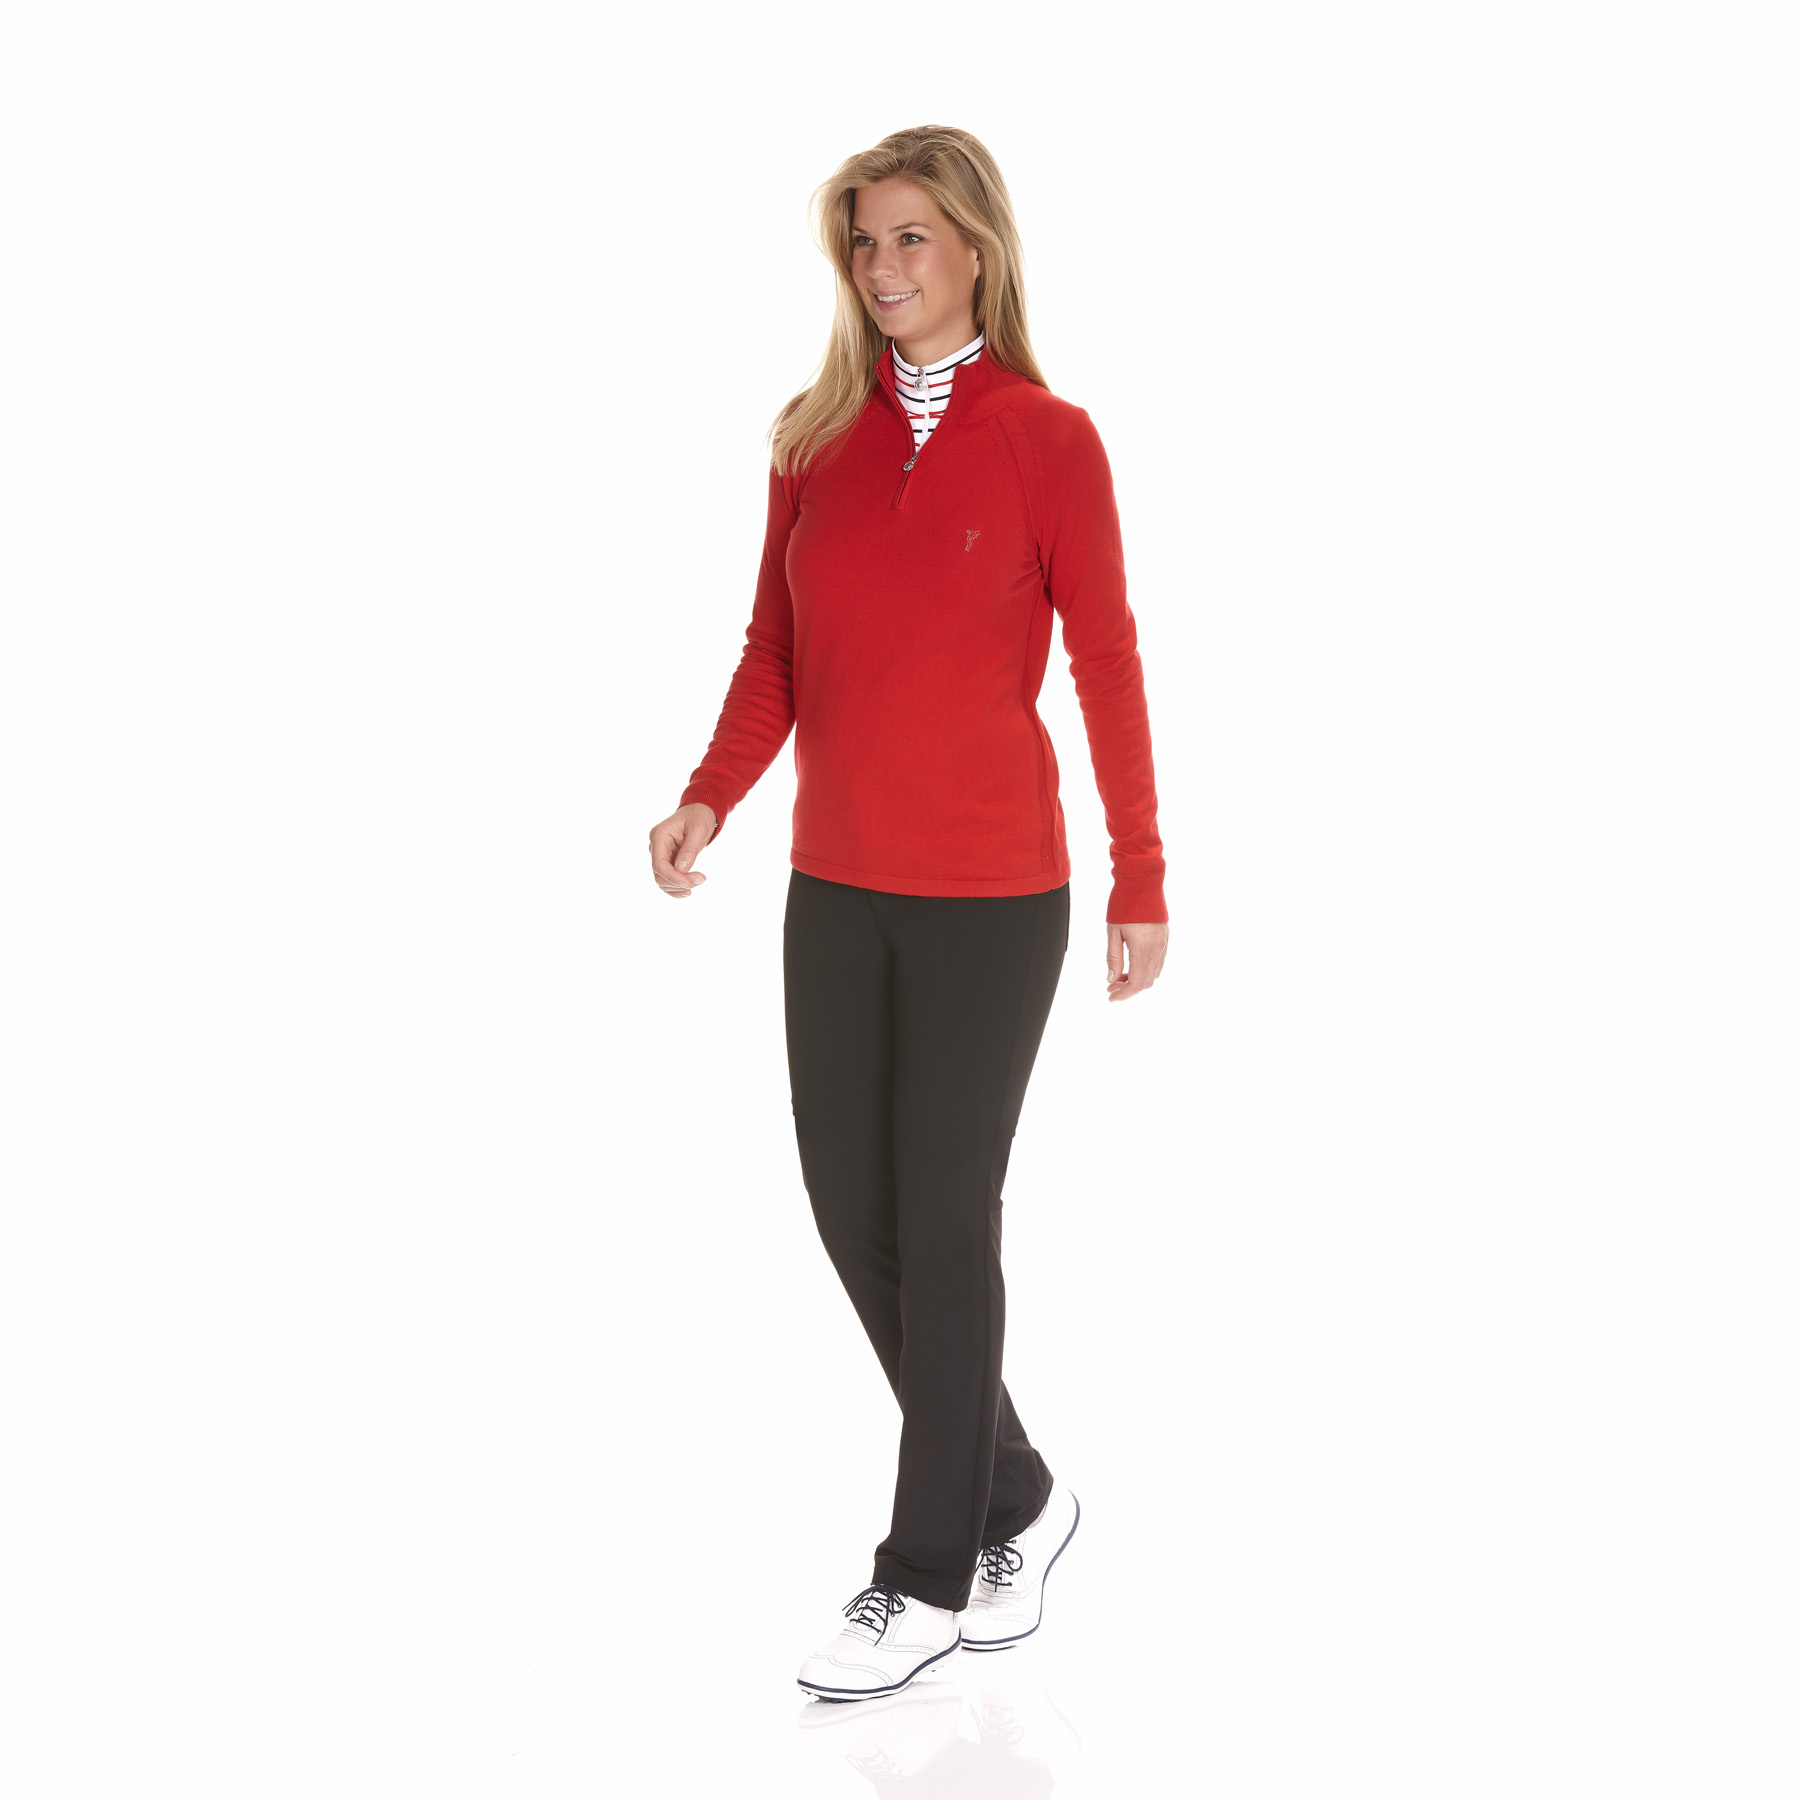 Damen Baumwoll/Kaschmir Strickpullover mit kurzem Zip